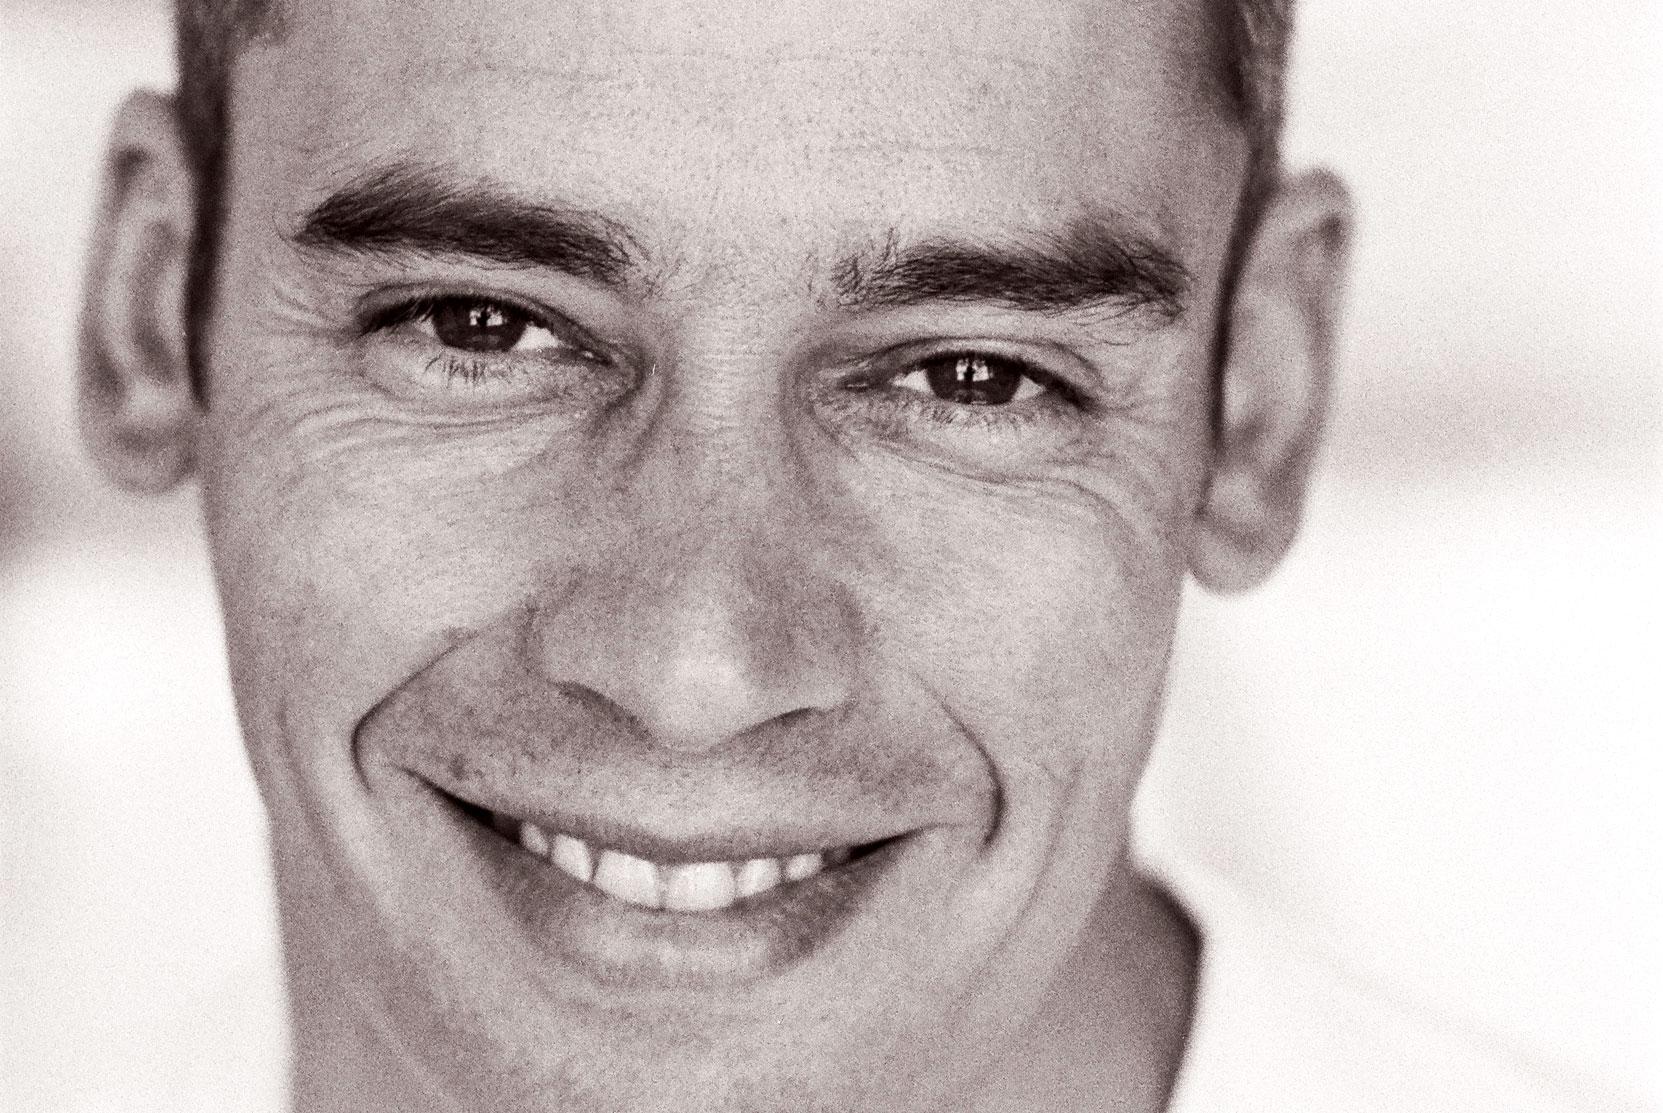 � Olivier Chauvel